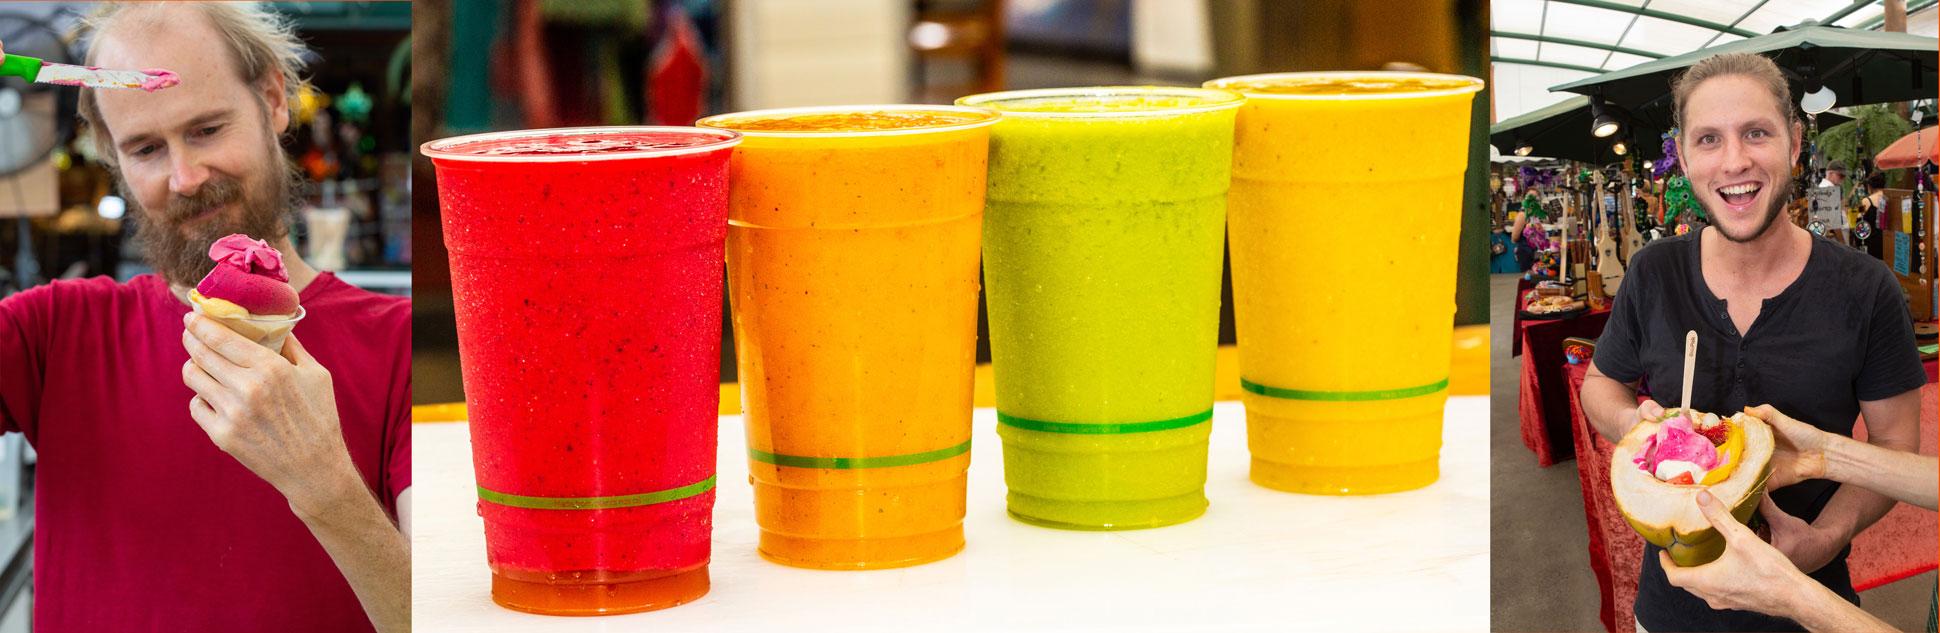 Organic Juice and food